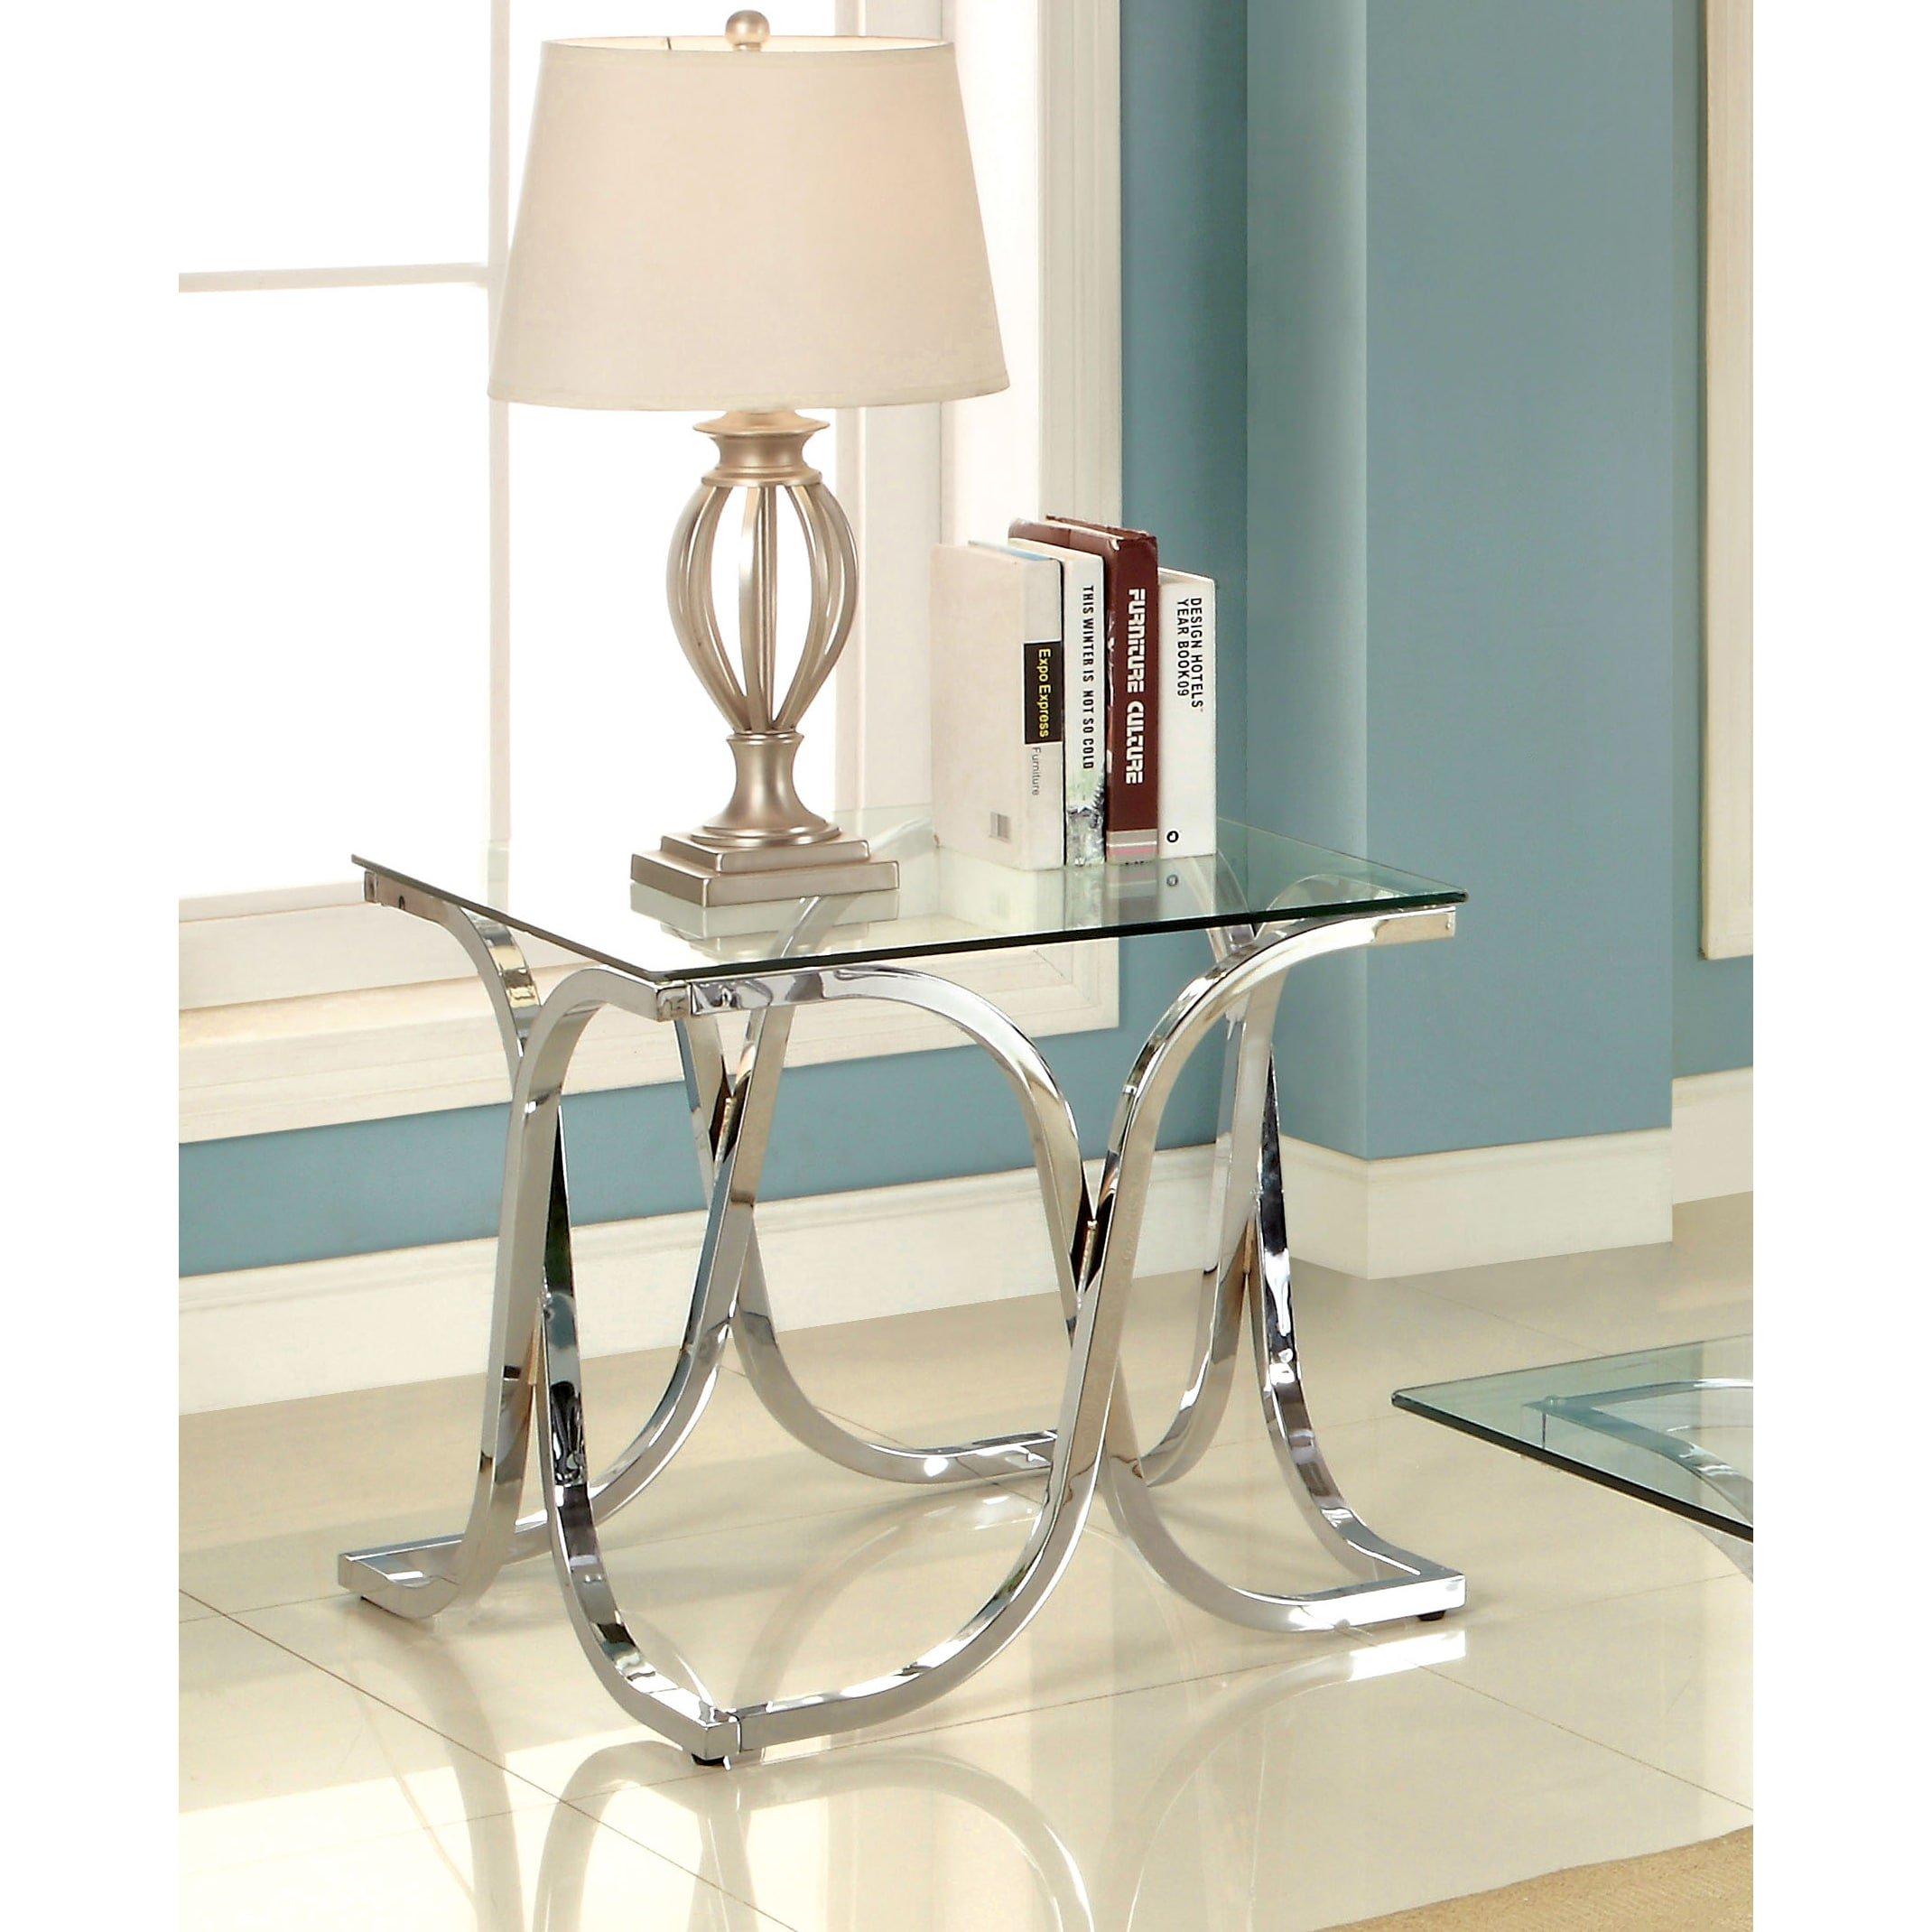 Furniture of America Artenia Modern Chrome End Table